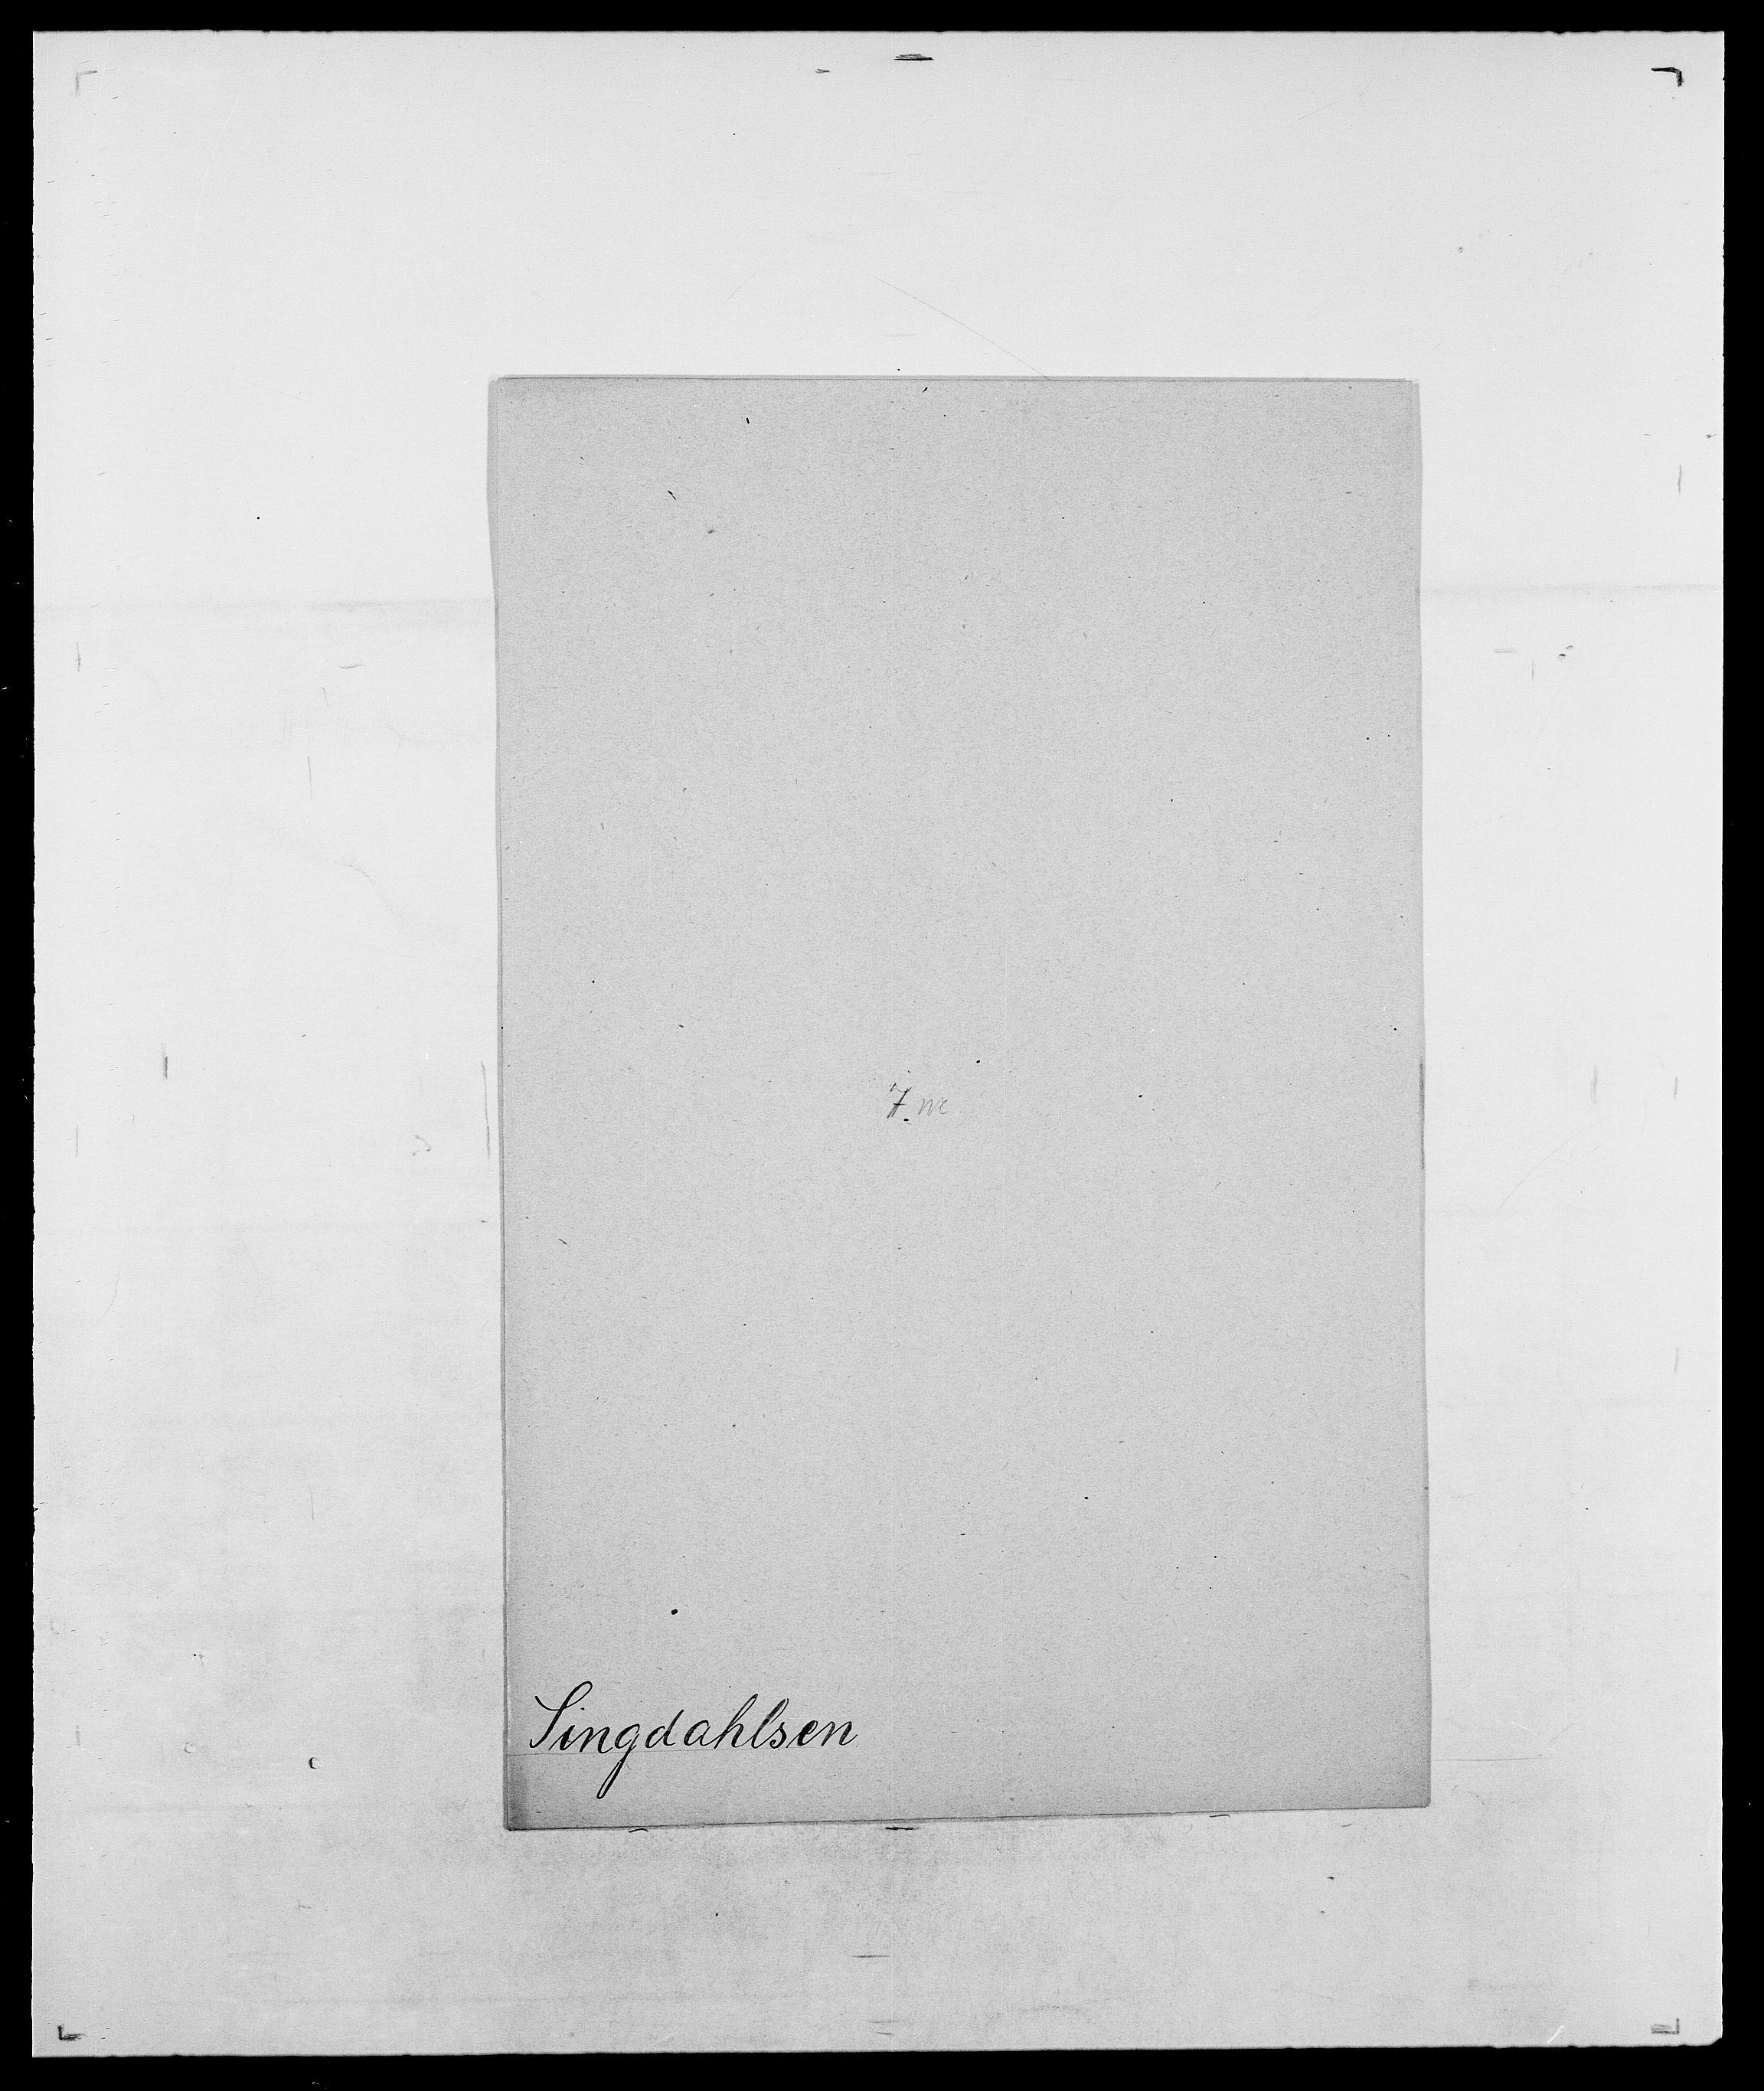 SAO, Delgobe, Charles Antoine - samling, D/Da/L0035: Schnabel - sjetman, s. 930